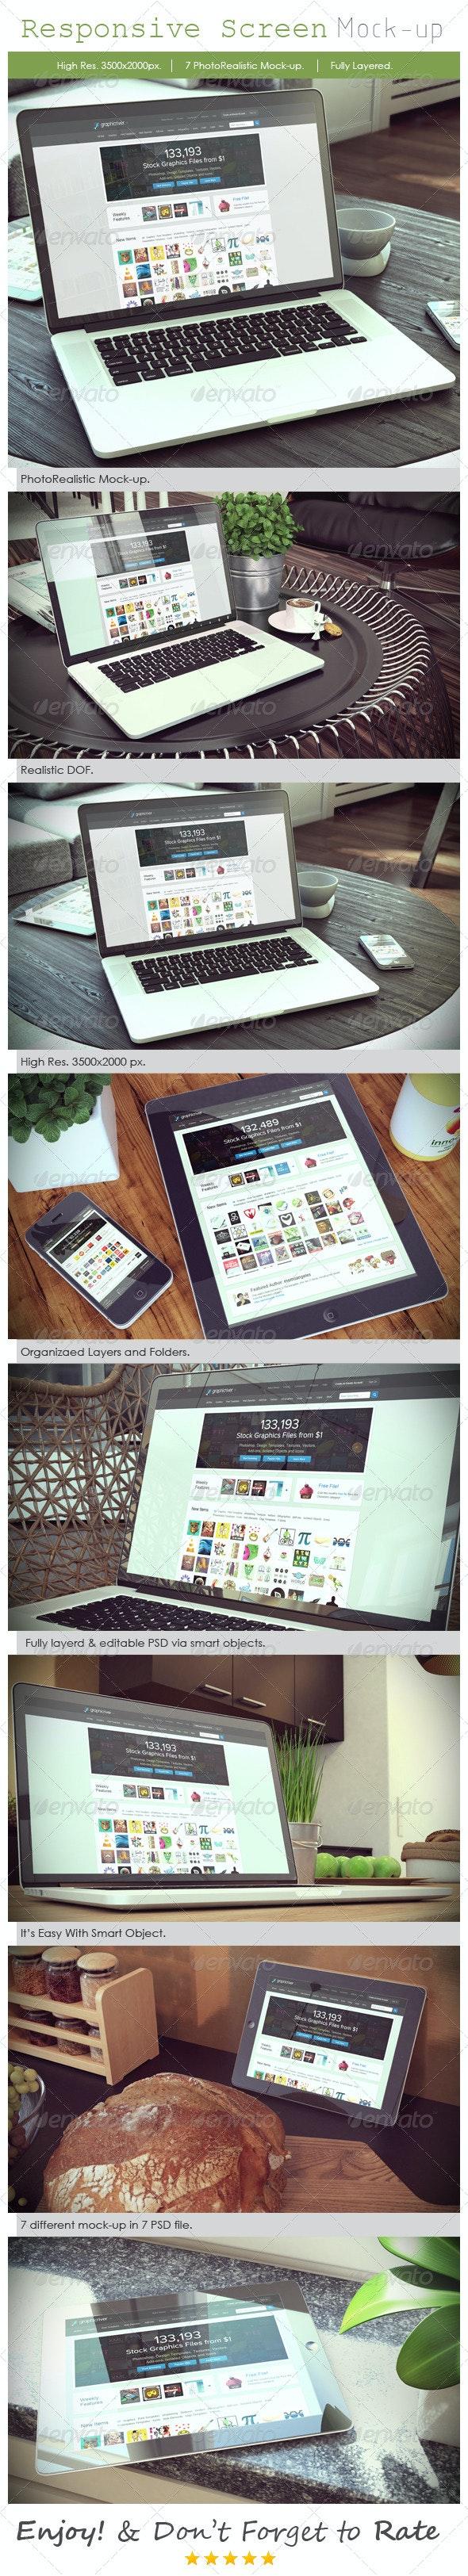 Responsive Device Mockup V3 - Displays Product Mock-Ups